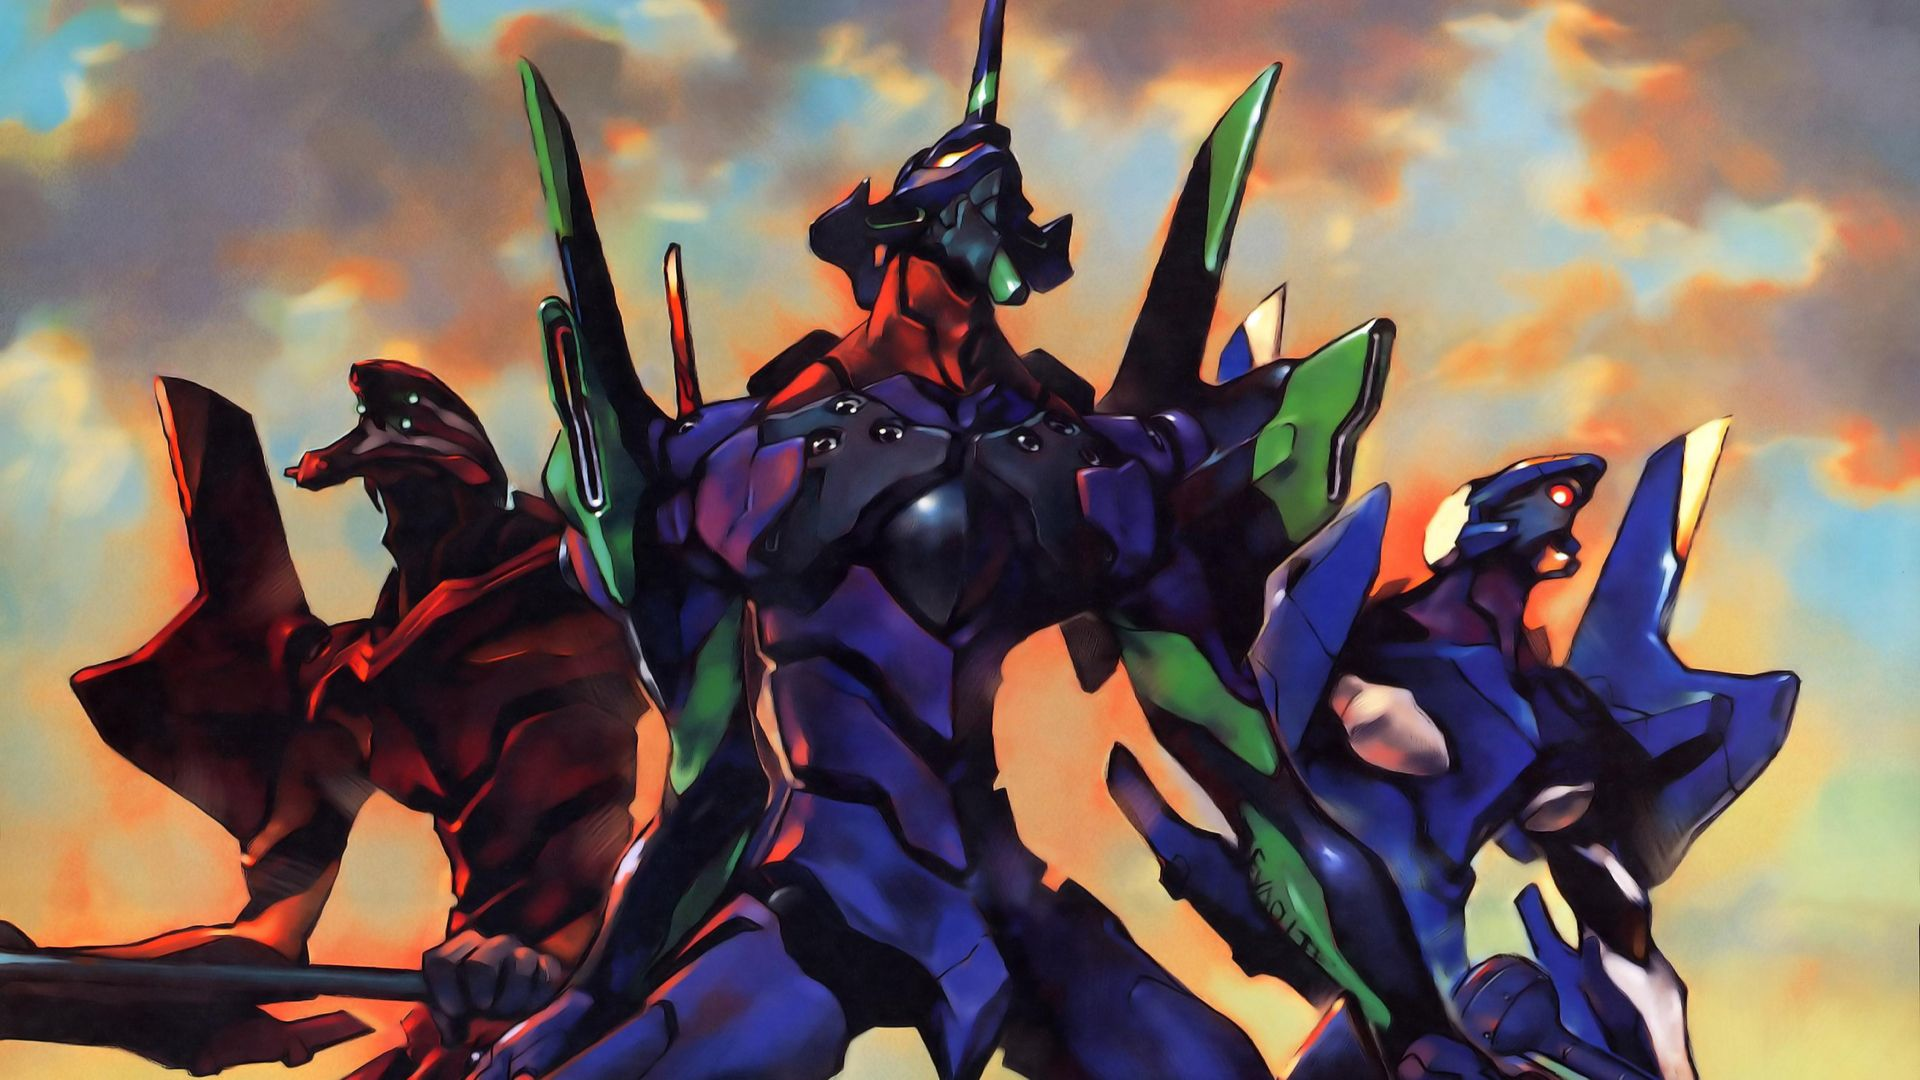 Neon Genesis Evangelion Desktop Wallpapers Top Free Neon Genesis